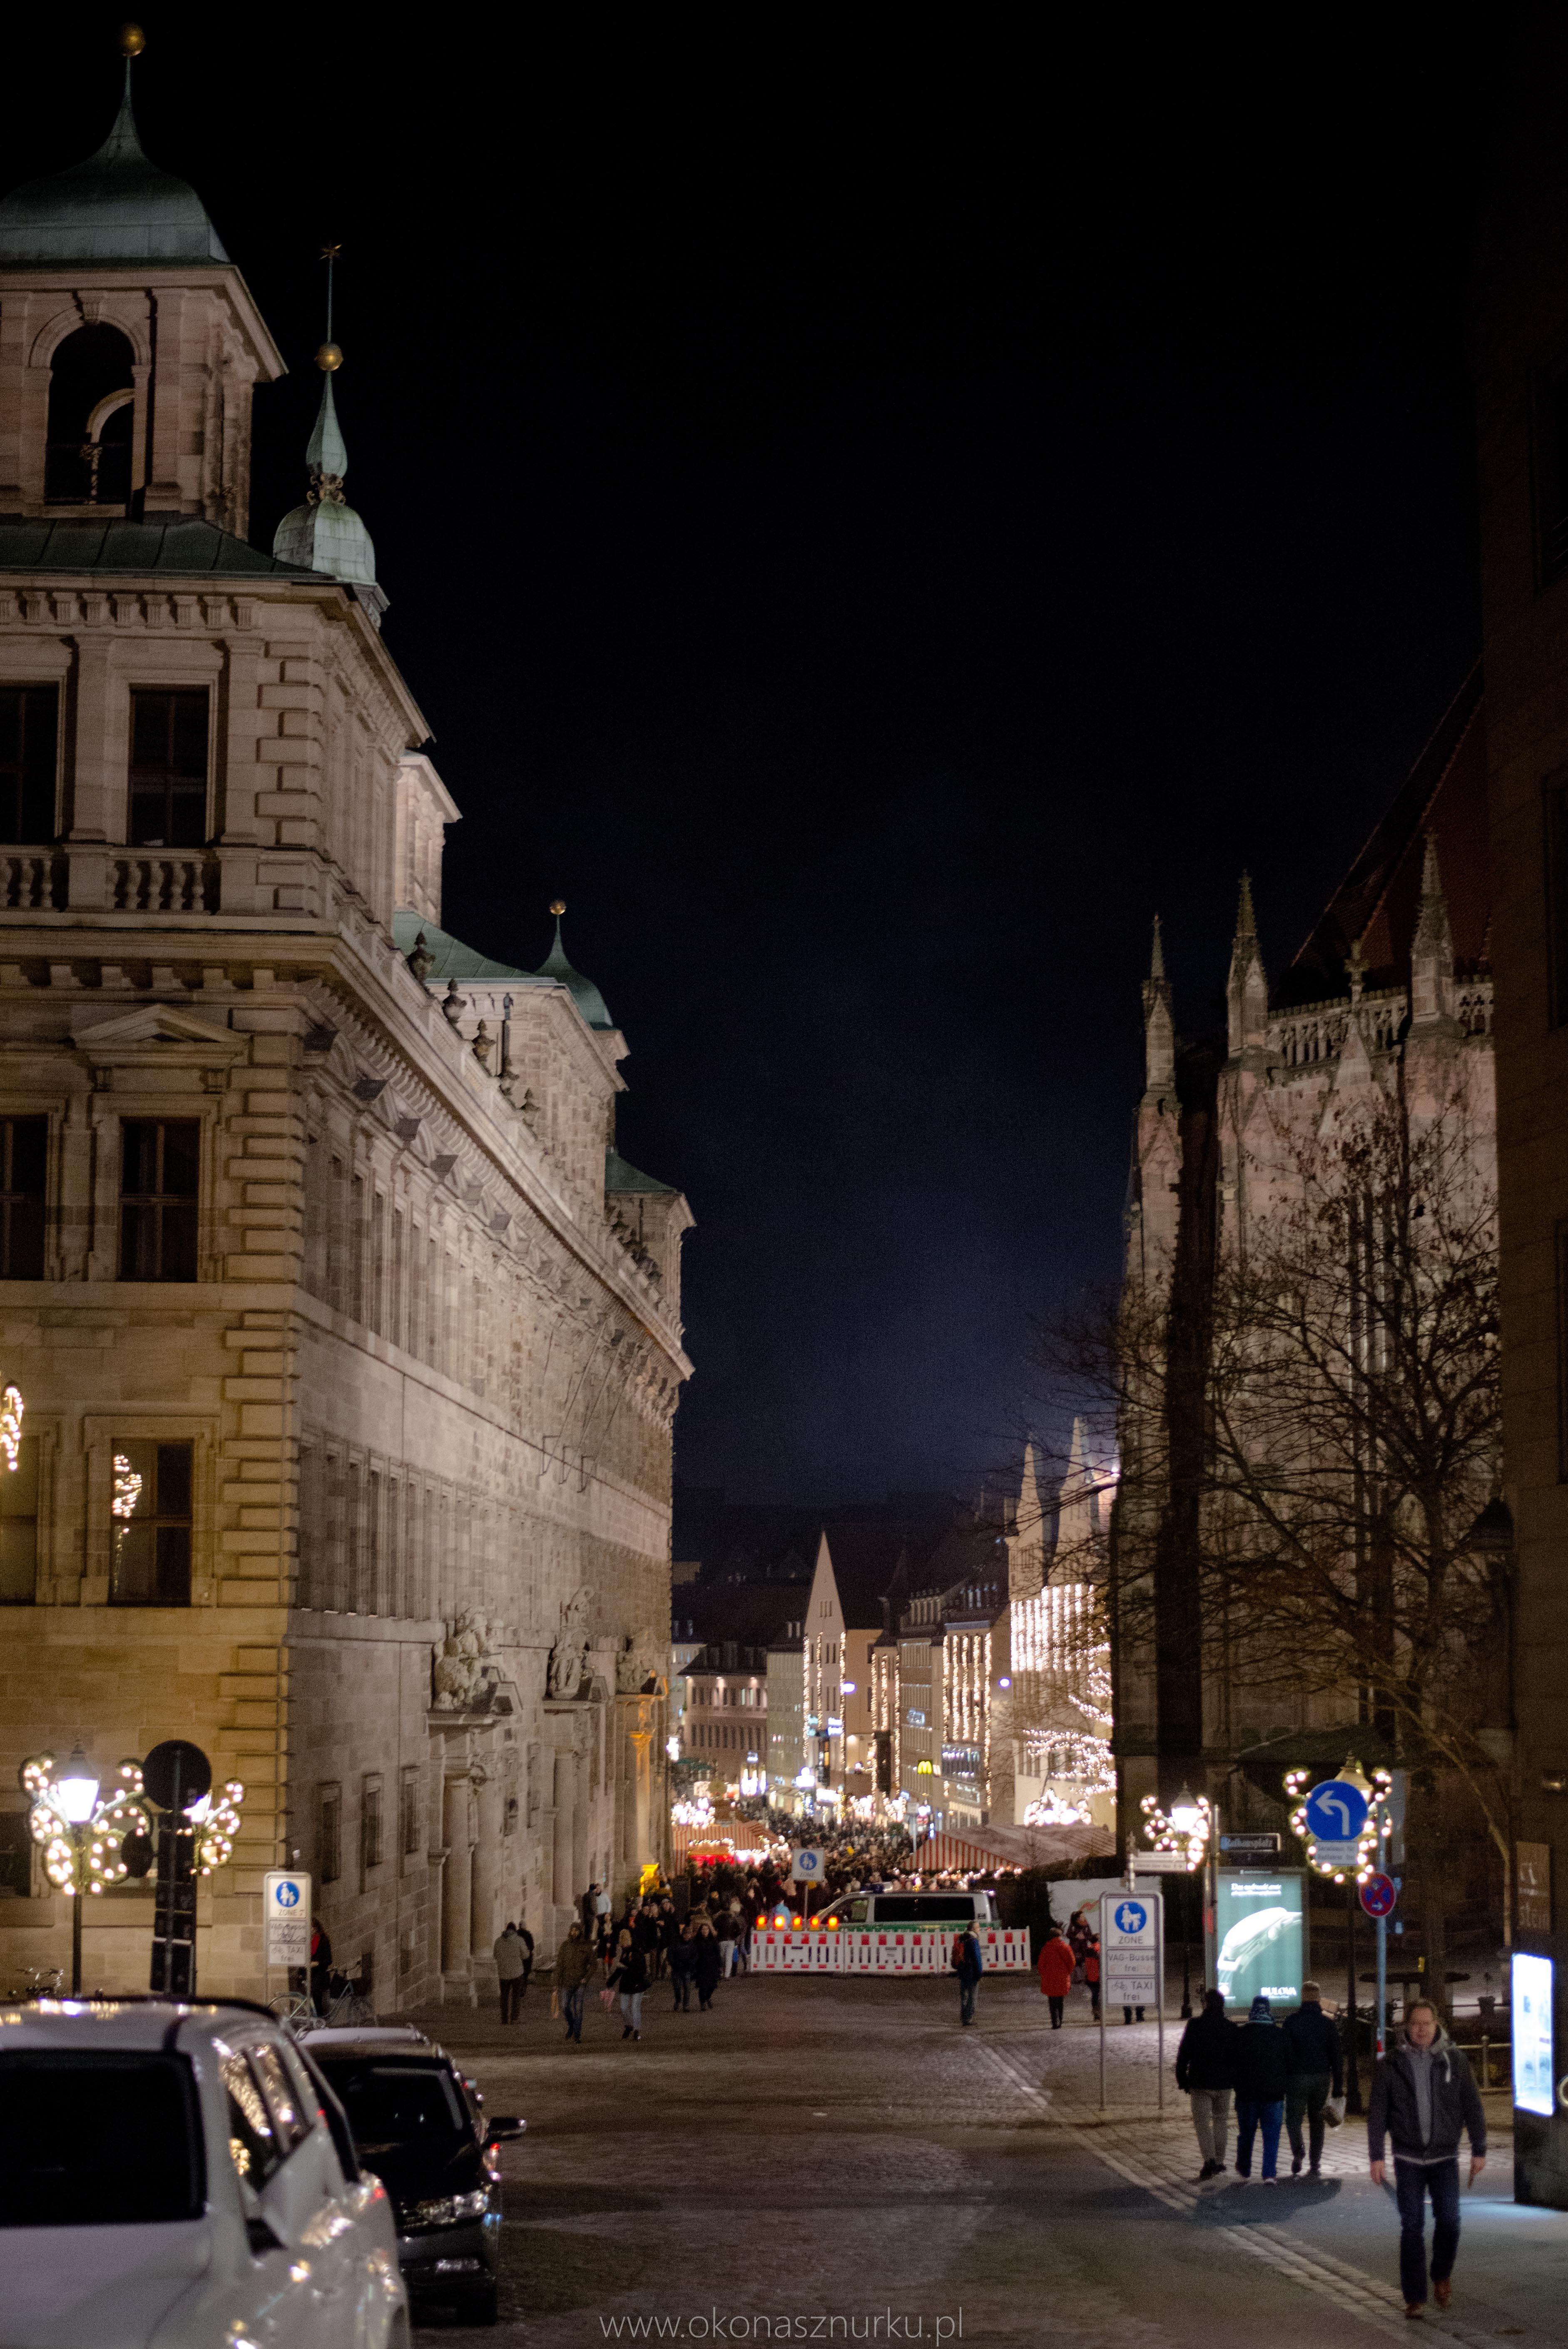 Nürnberg-stadt-norymberga-bayern-city-frankonia (25)